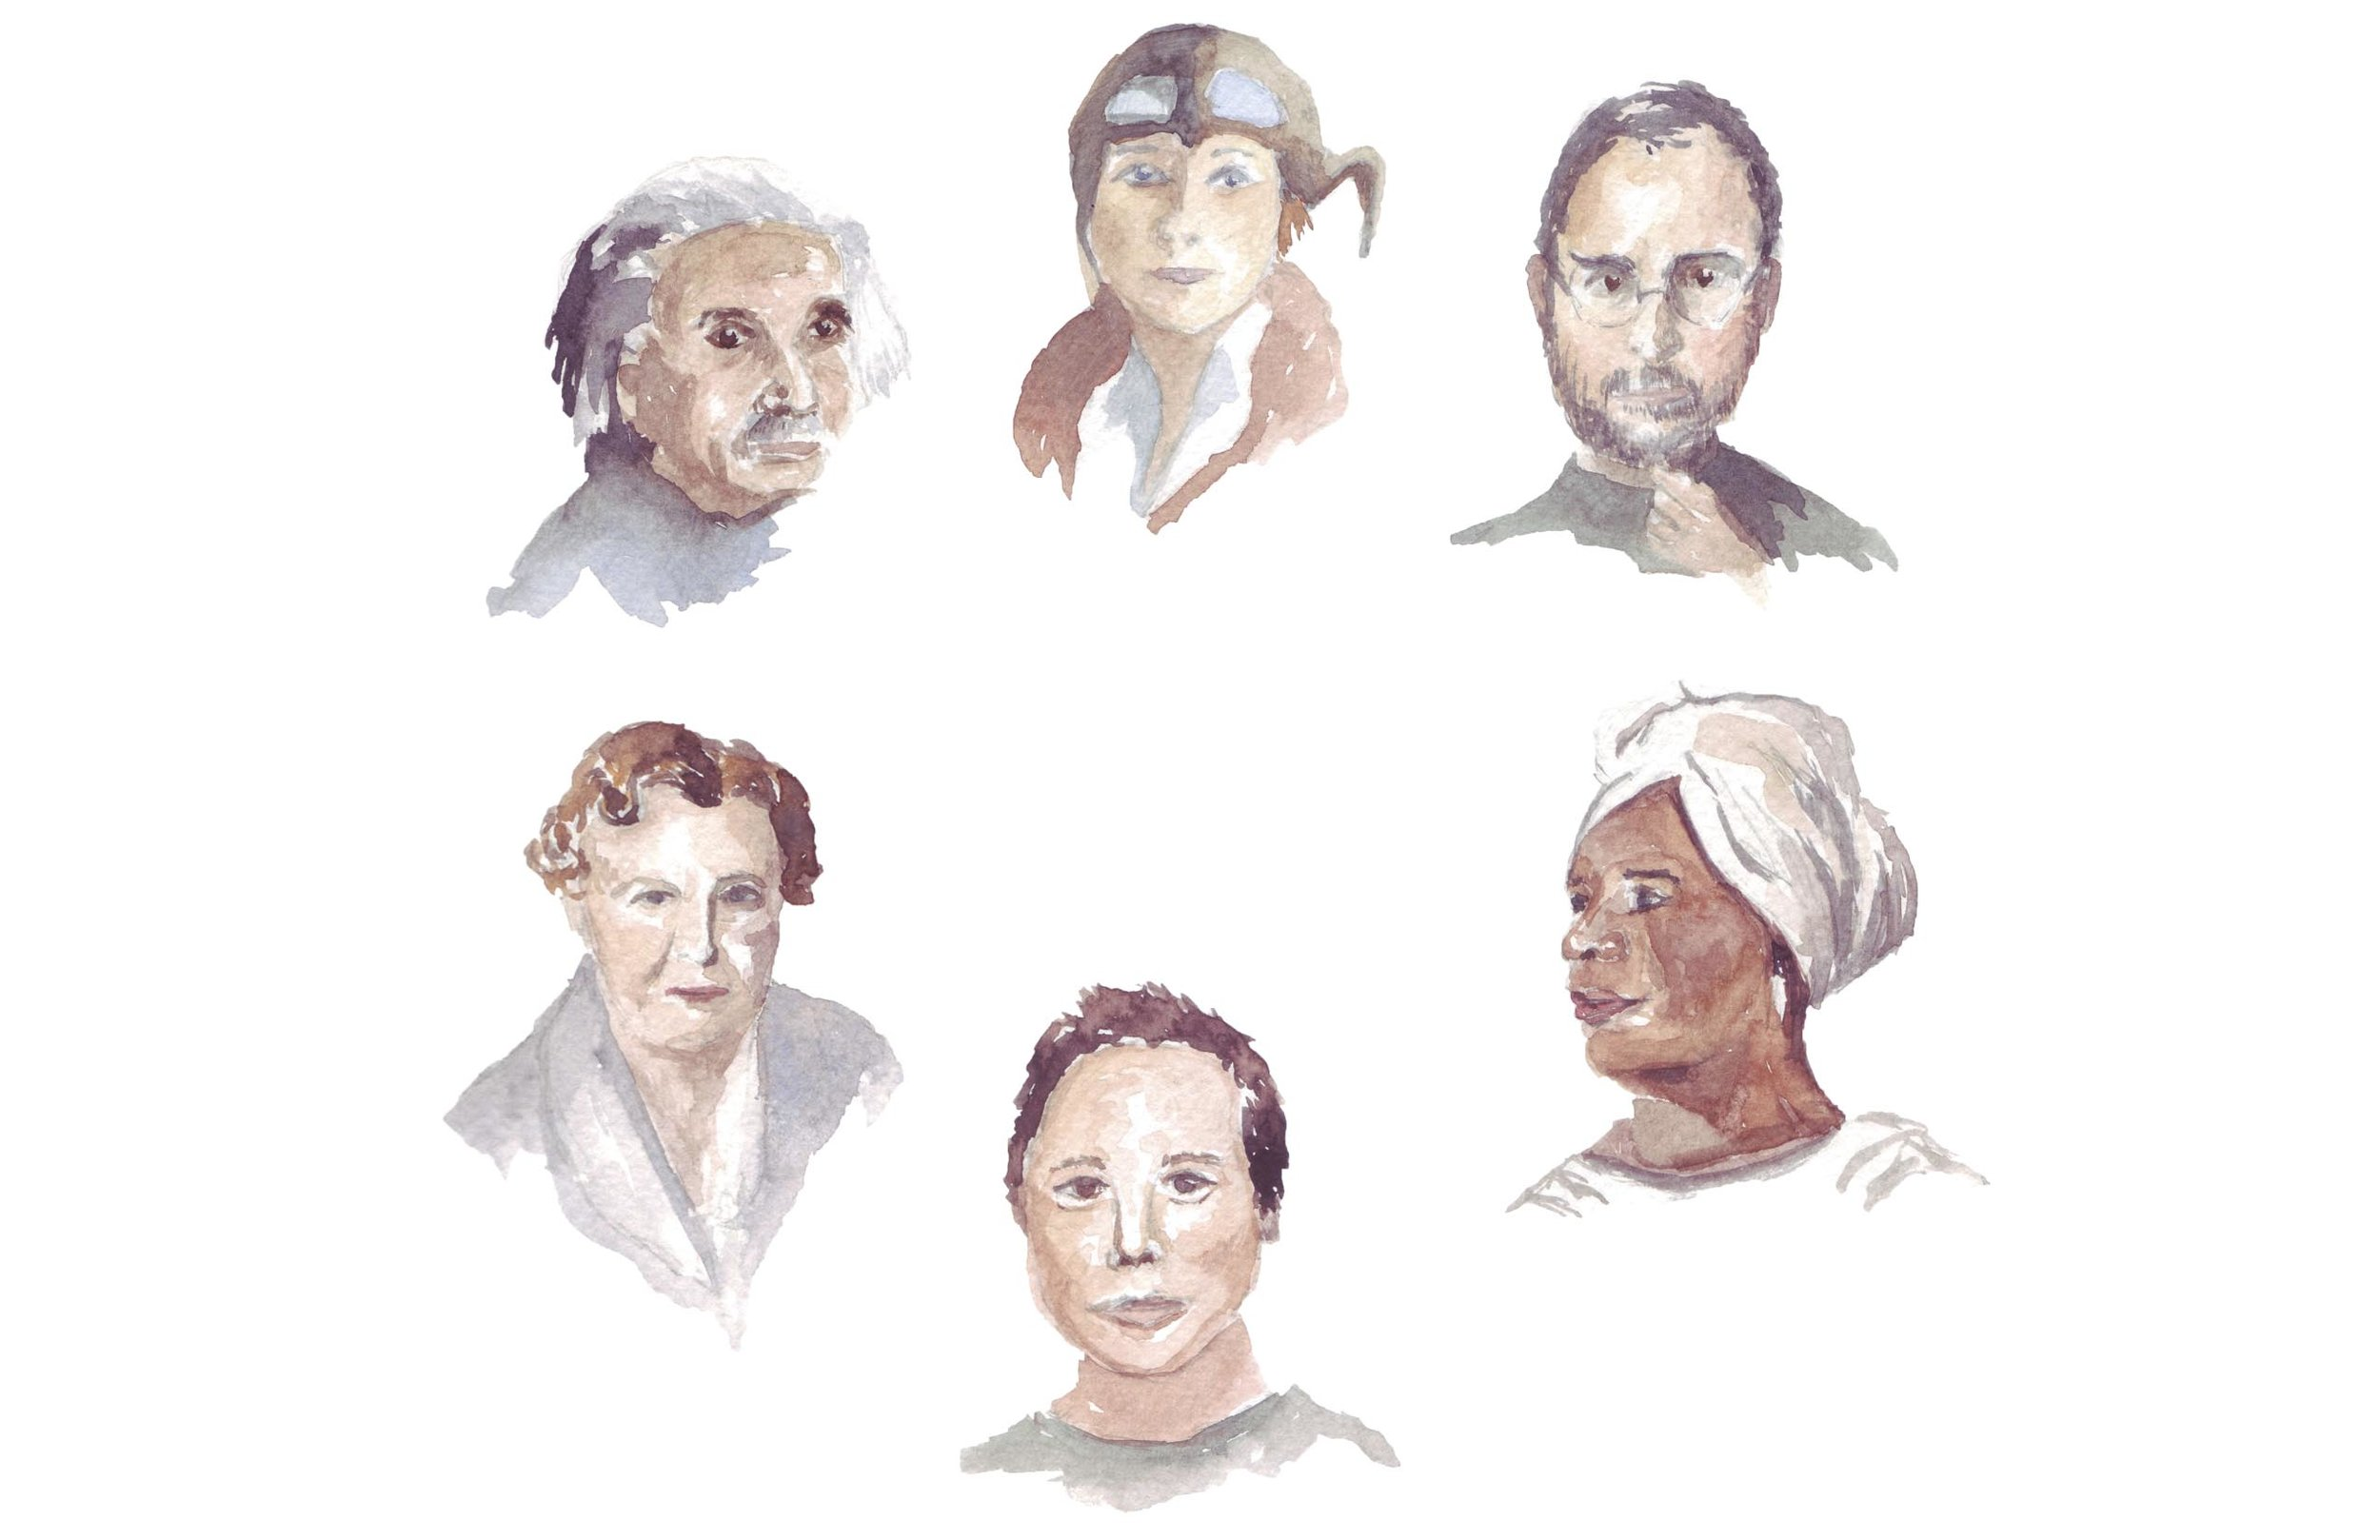 New York Innovators Series. December, 2015. Watercolor on paper.